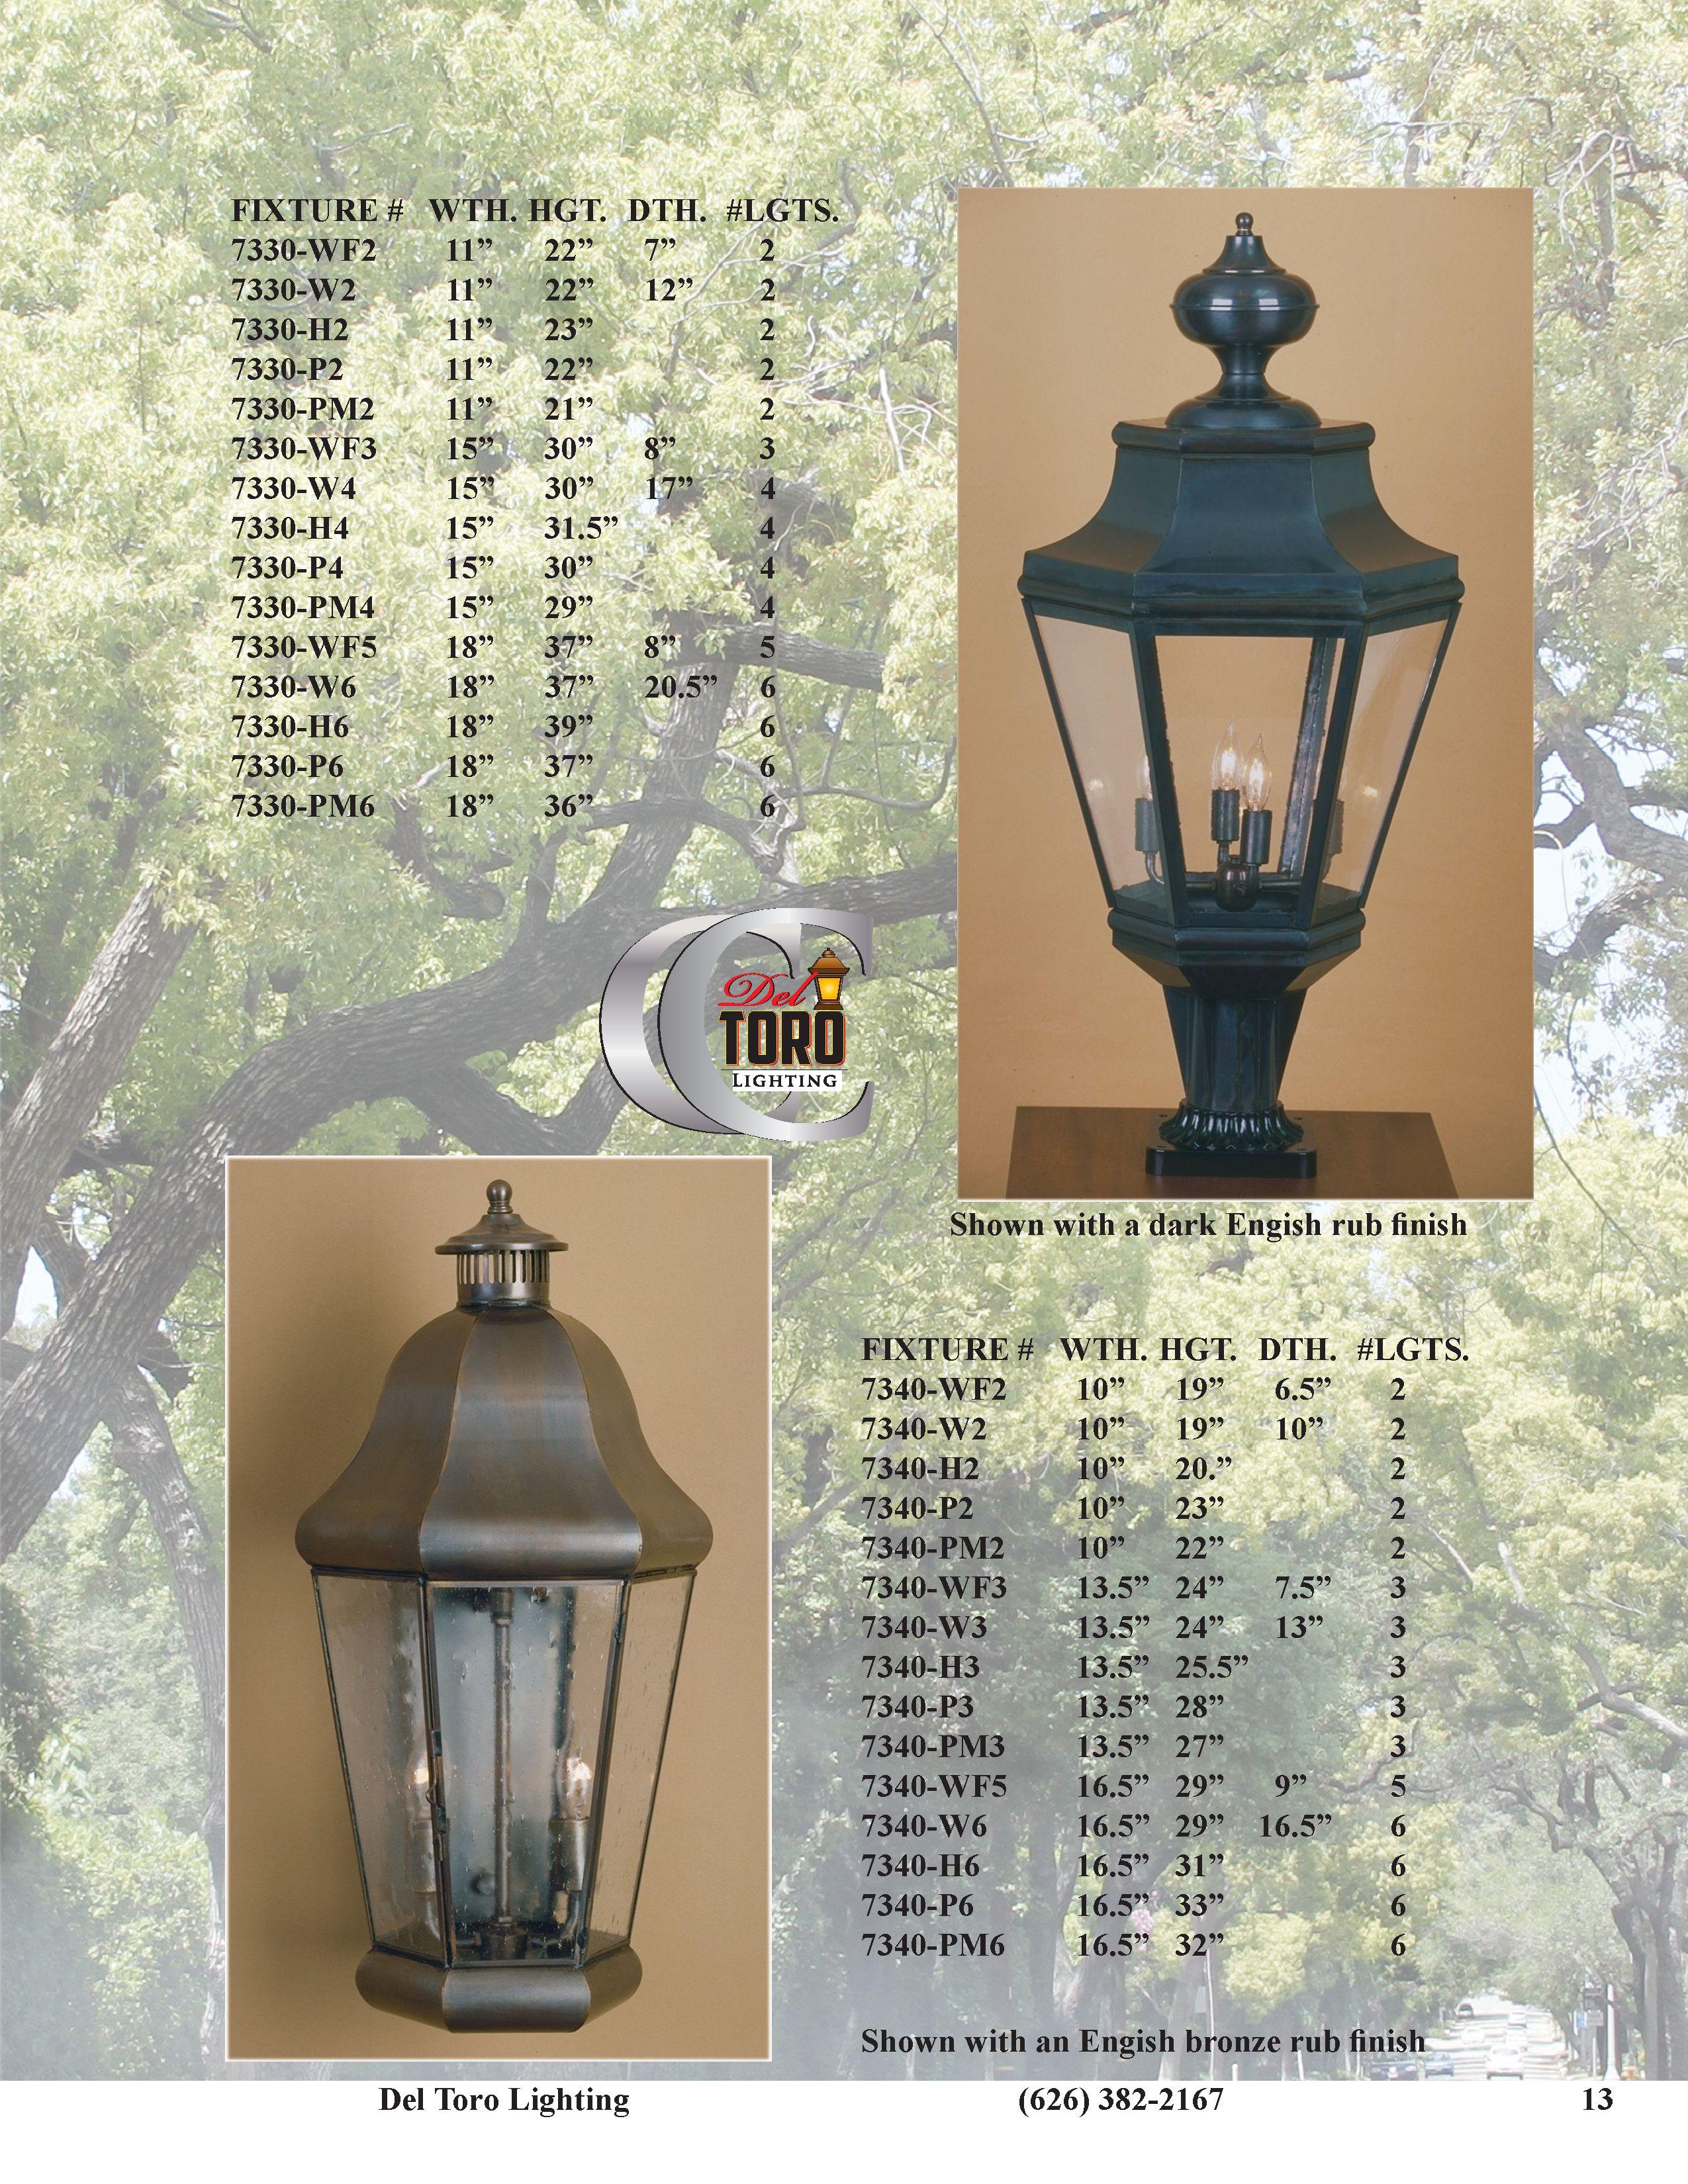 del toro lighting classic catalog